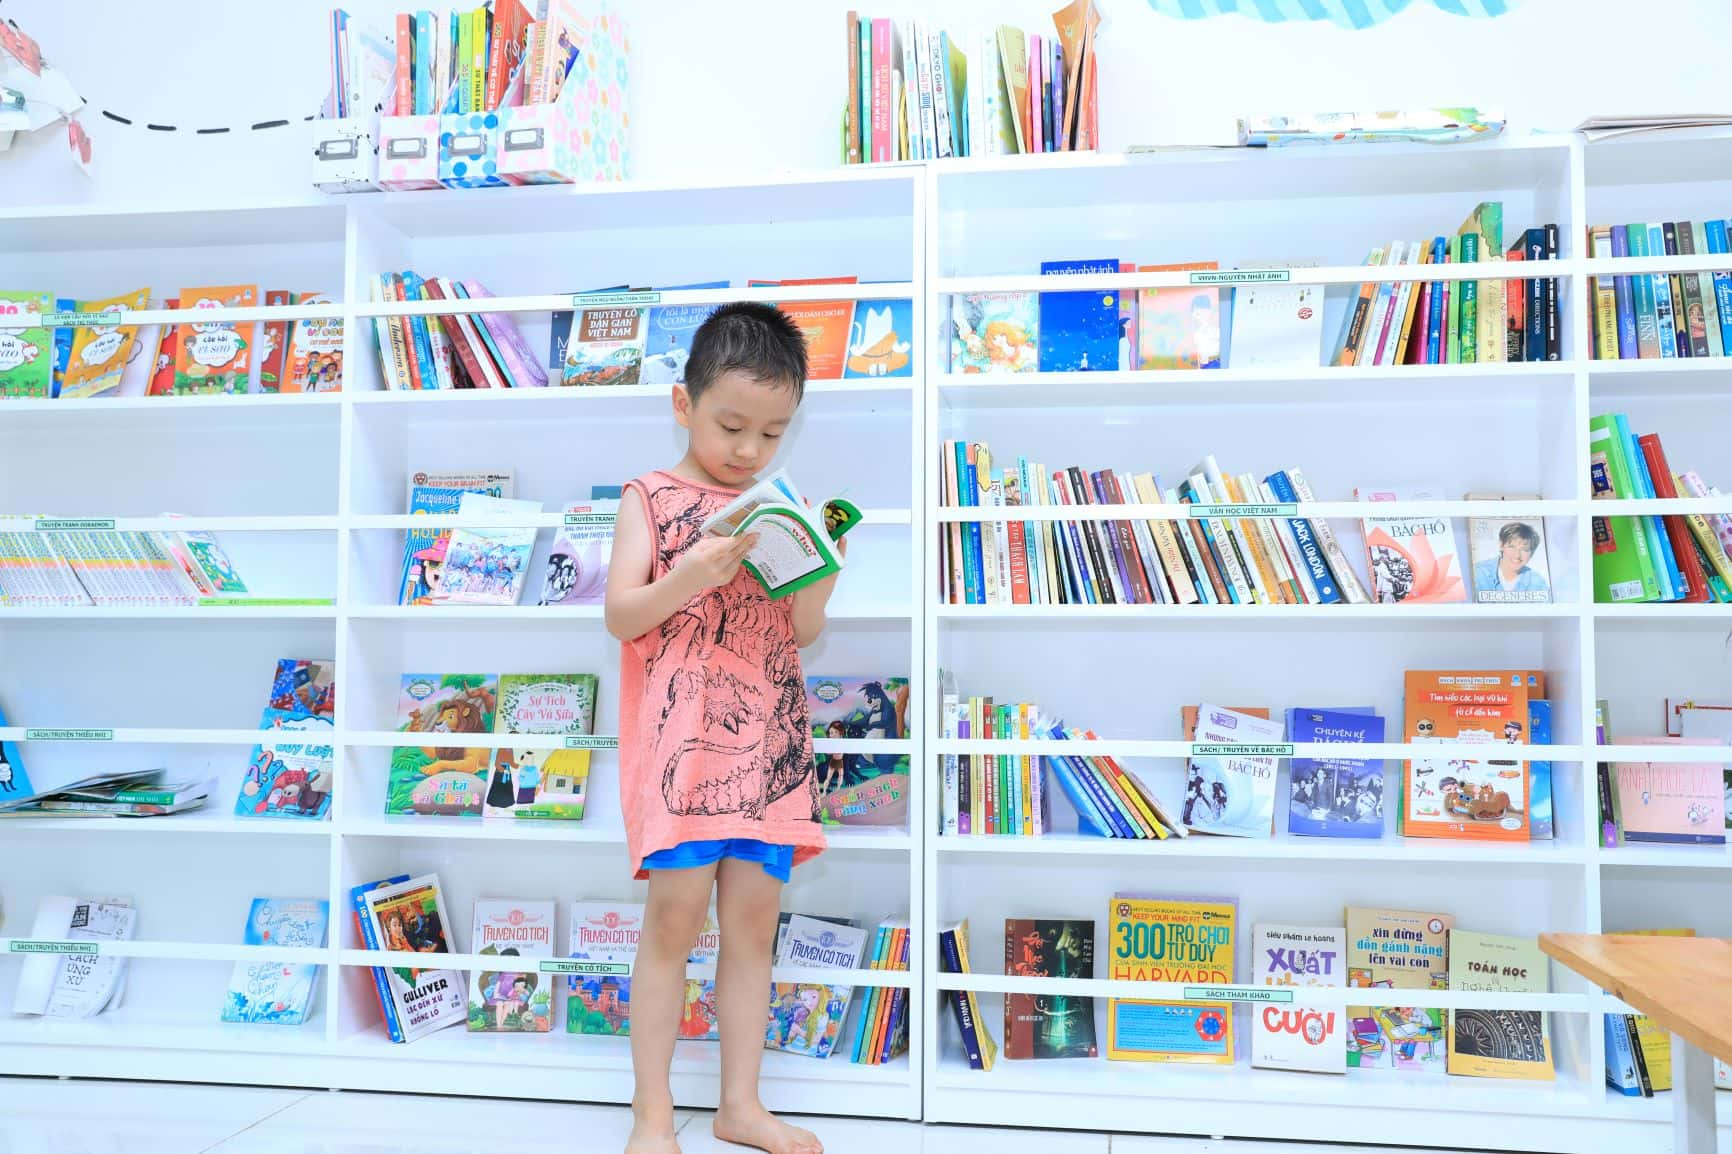 Hệ thống thư viện cao câp của Arden Park